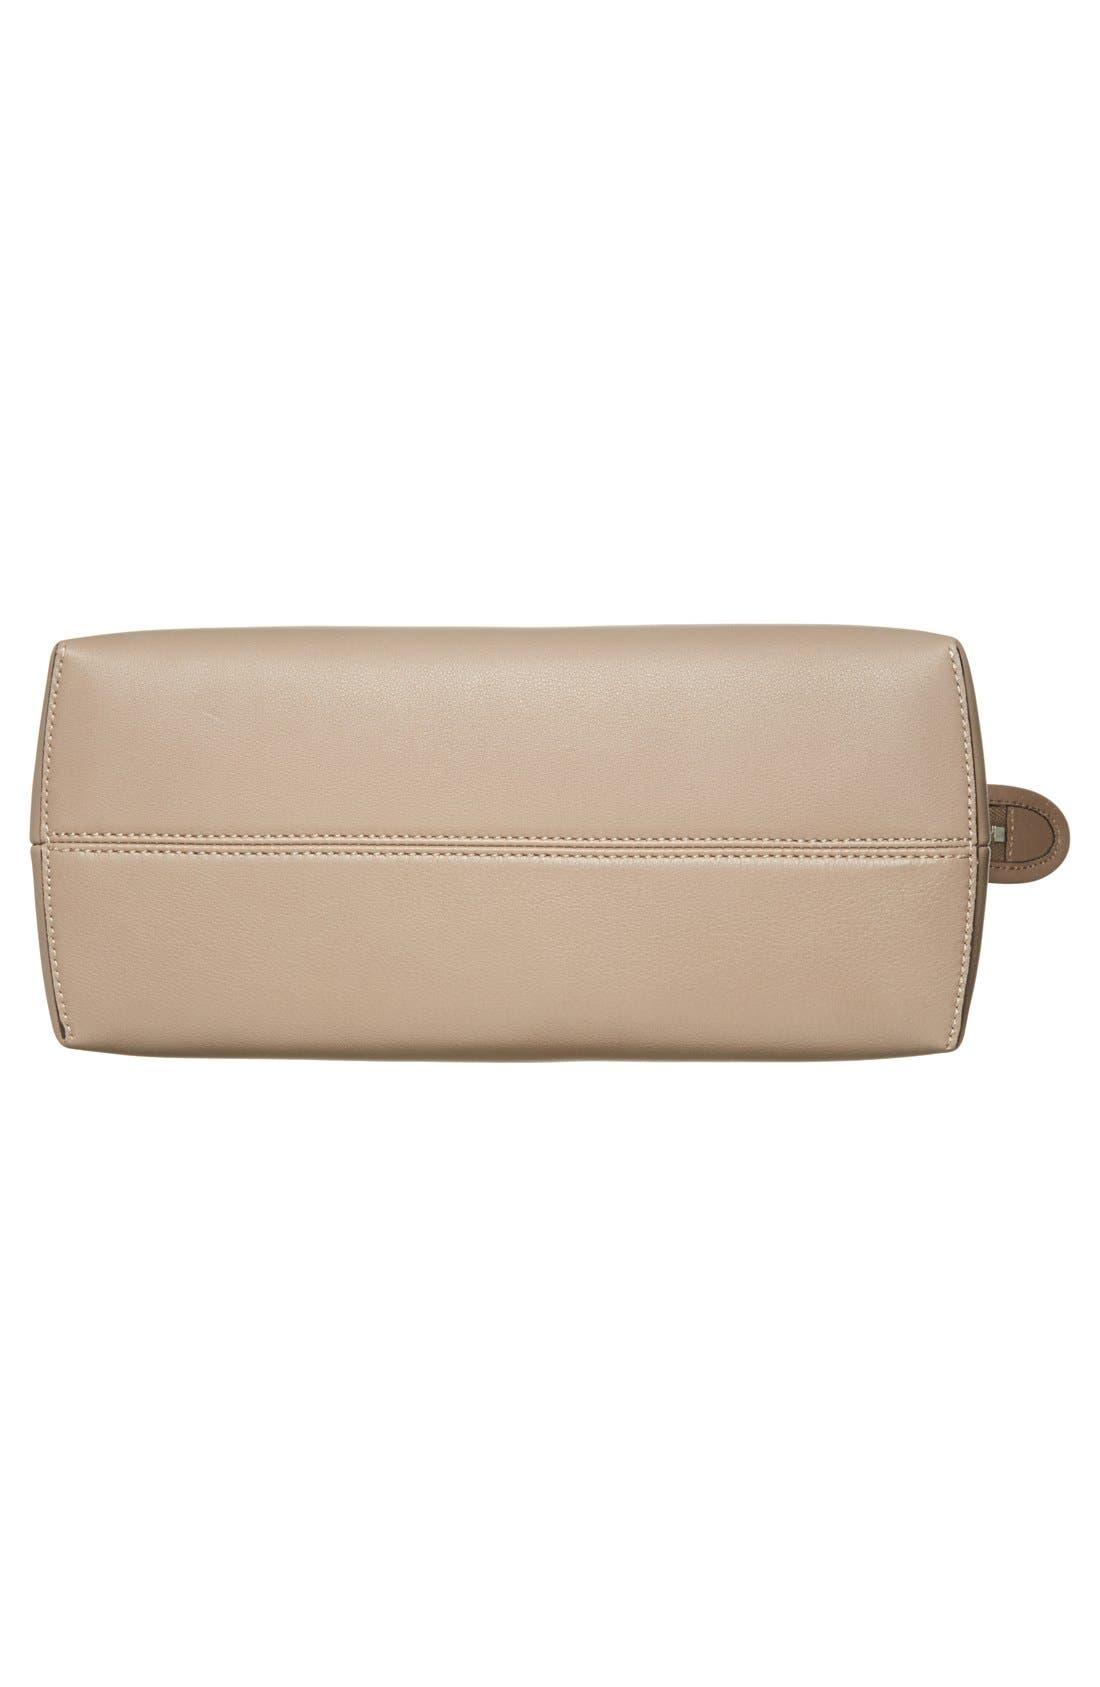 'Bauletto Piccolo' Leather Crossbody Bag,                             Alternate thumbnail 6, color,                             Turtledv Sepia Palladuim